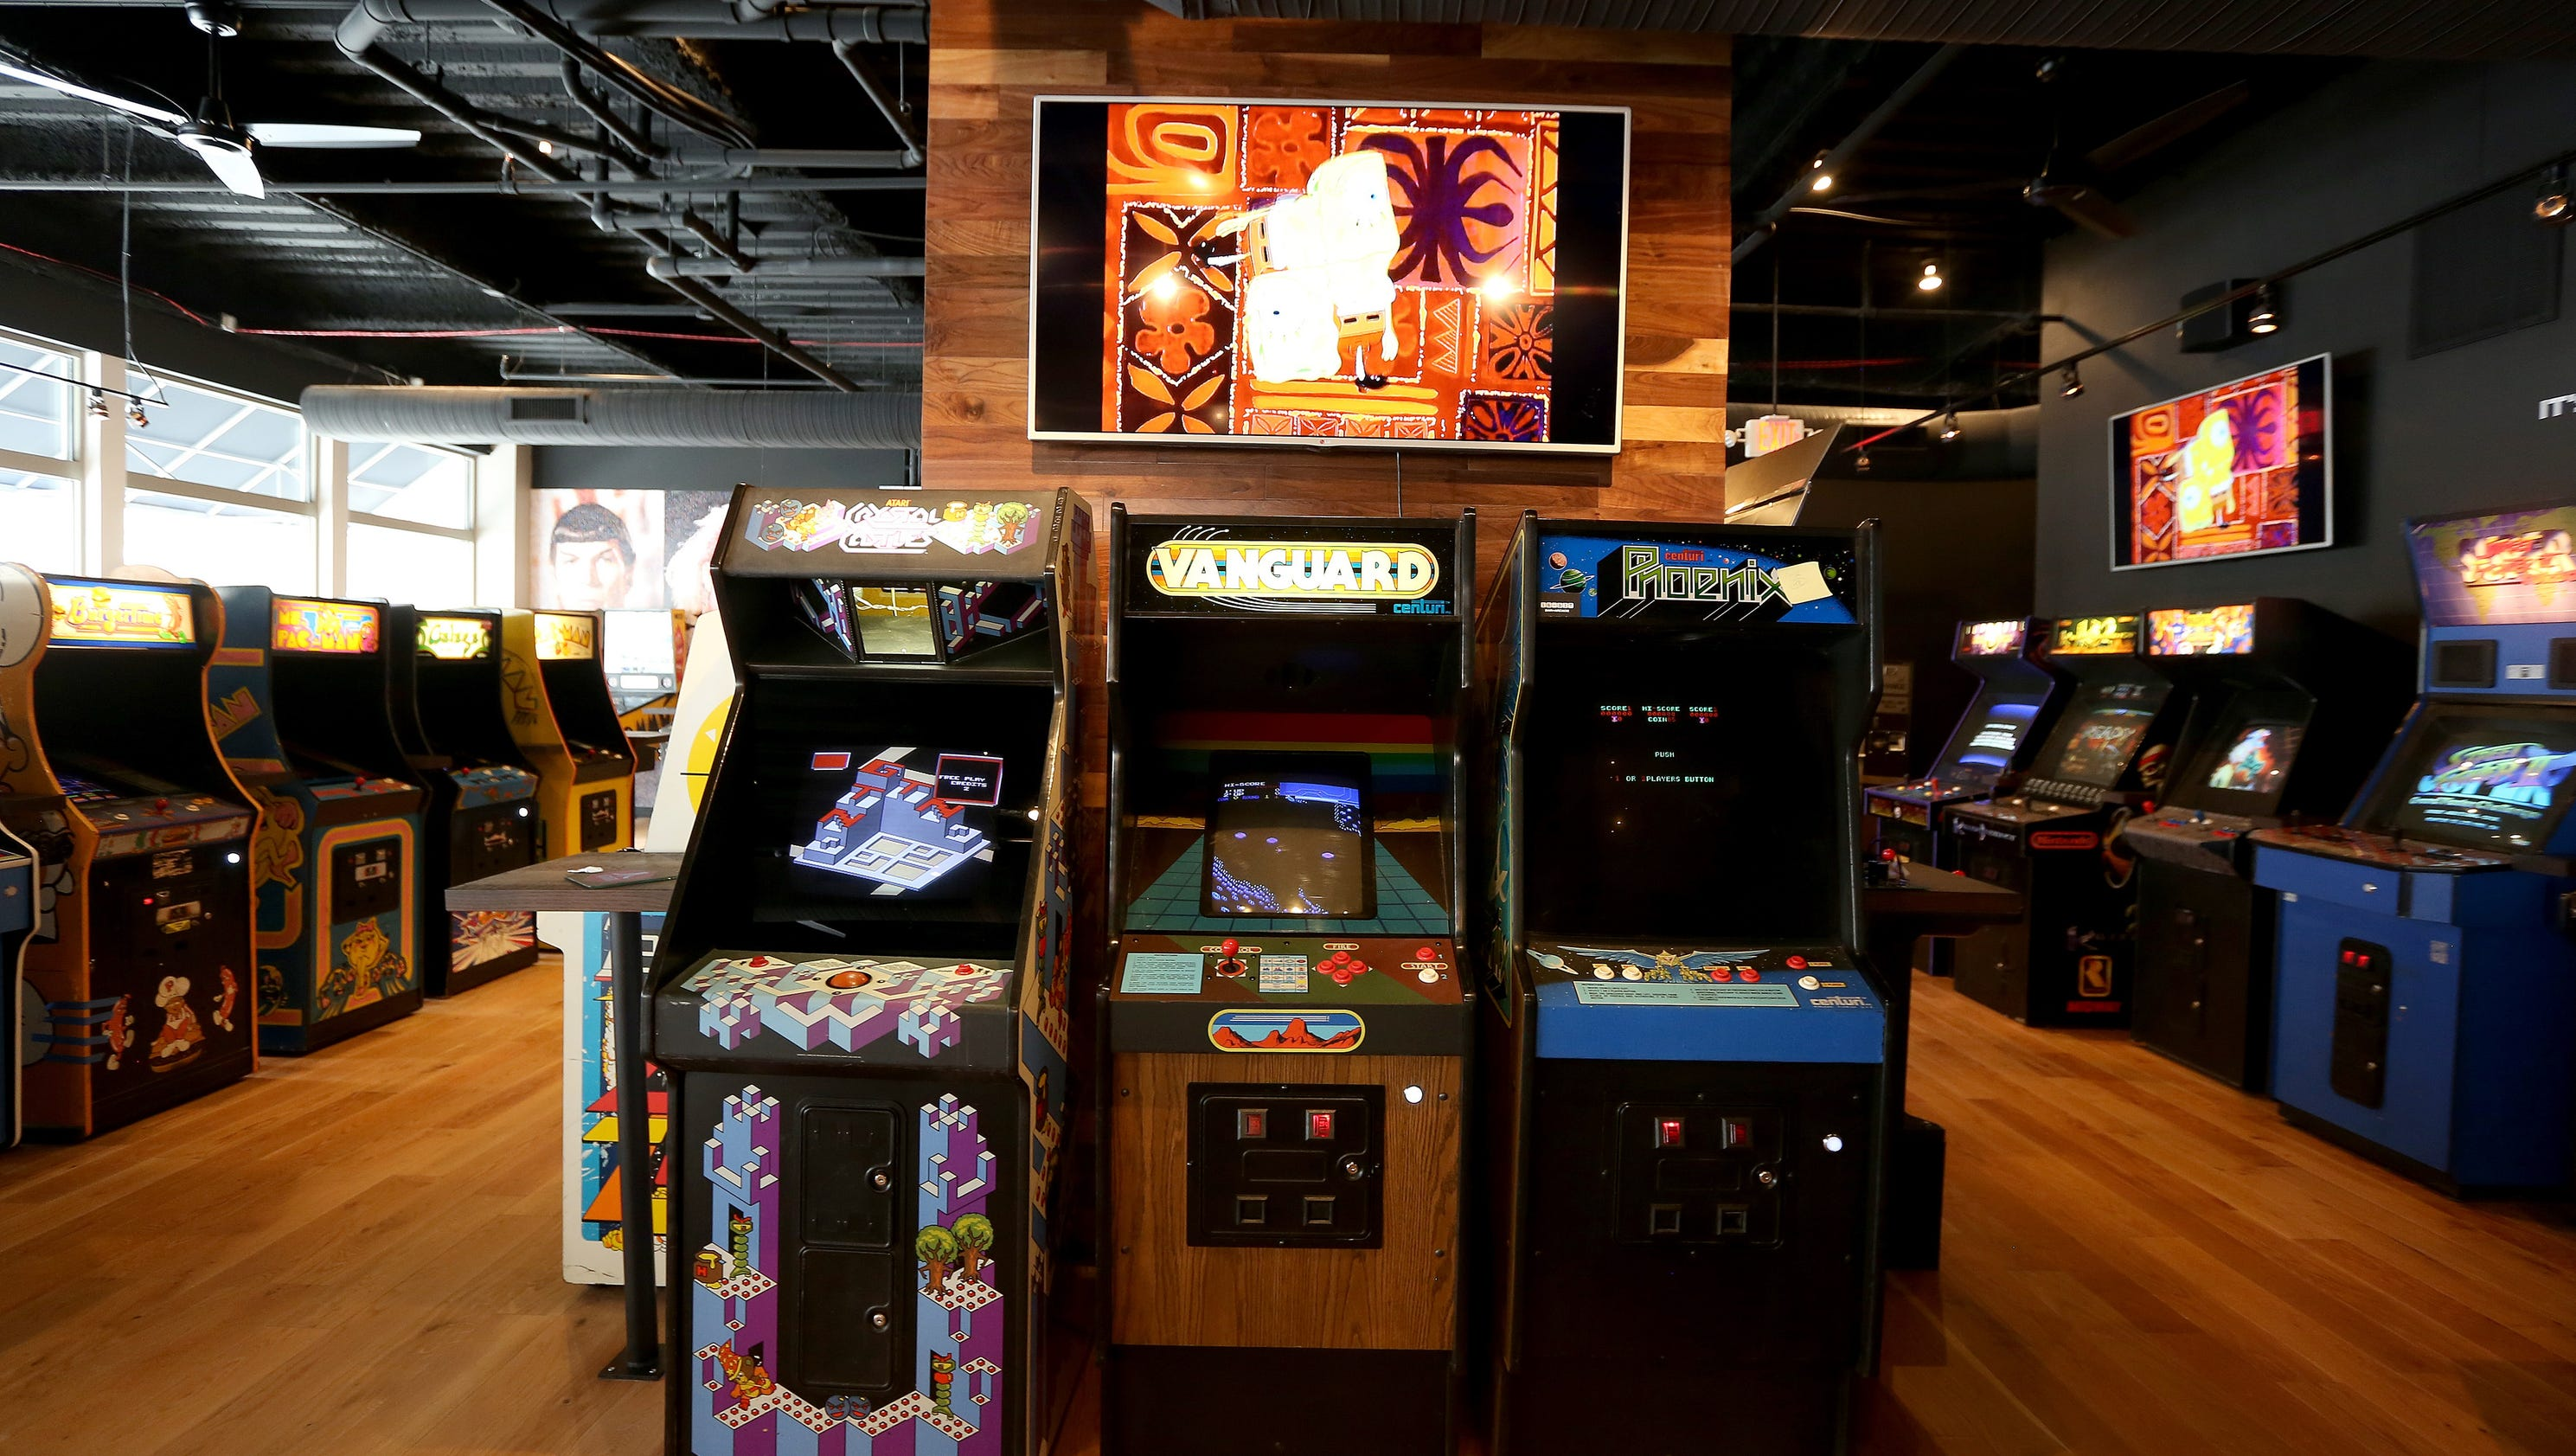 16 Bit Bar Arcade Opening In Otr